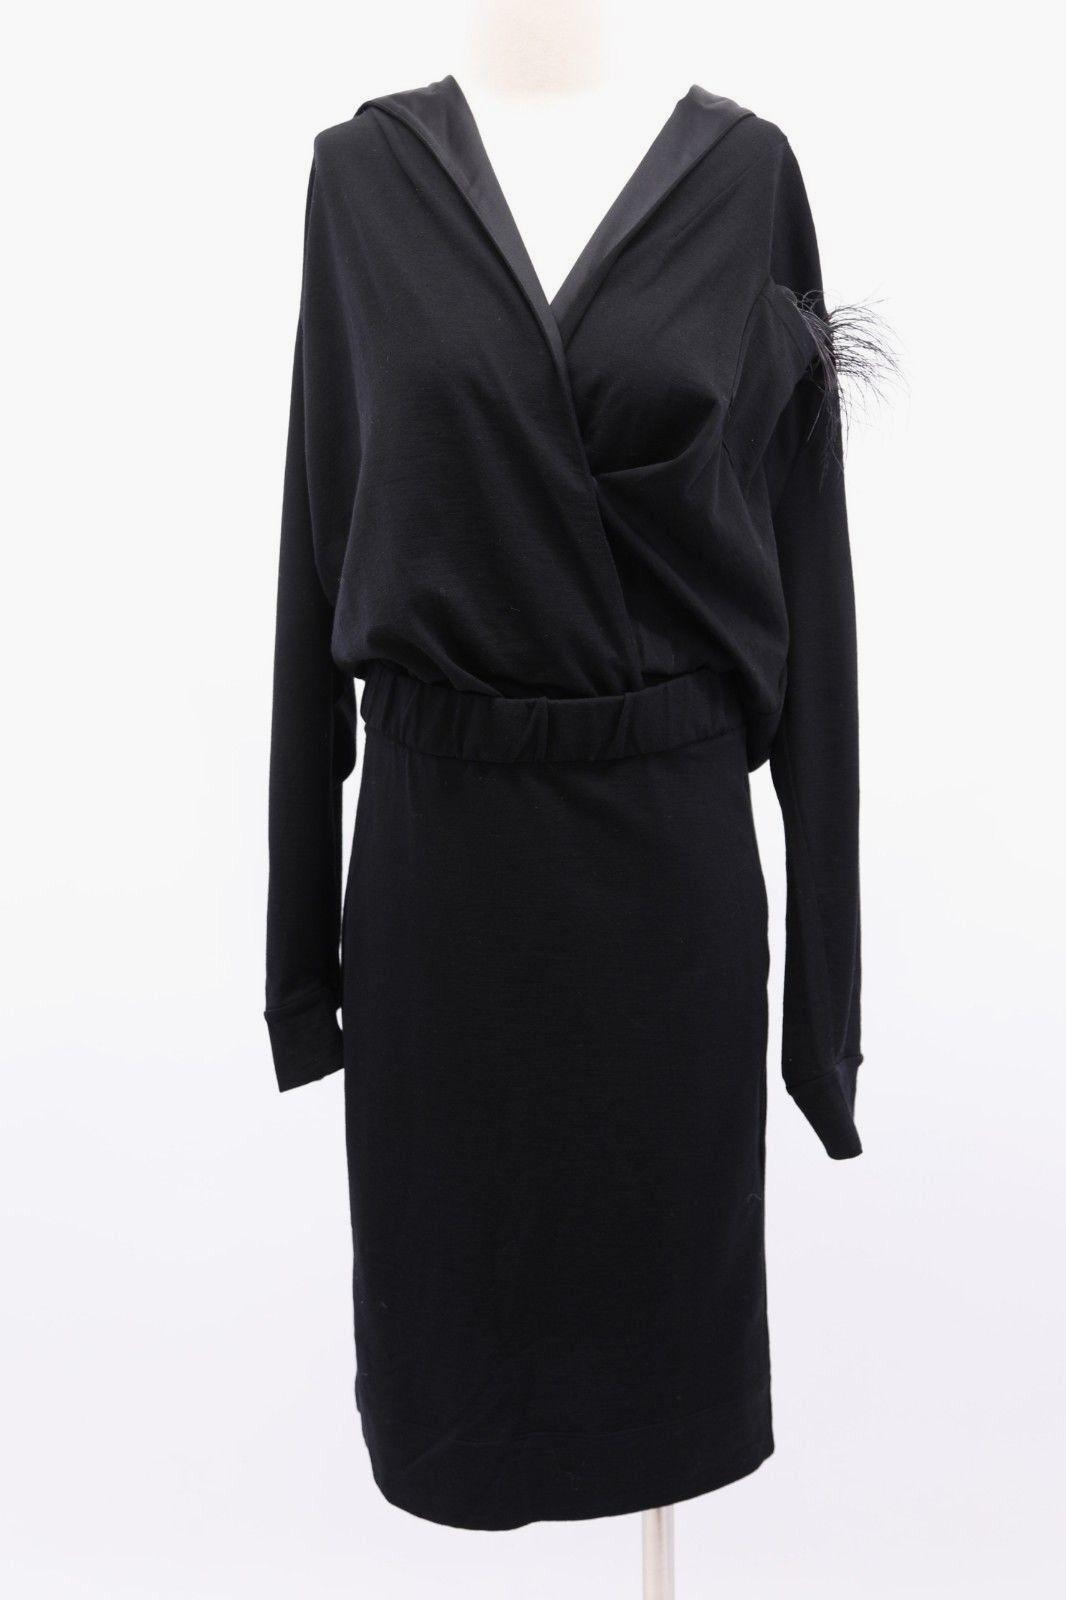 NWT 3325 Brunello Cucinelli Cucinelli Cucinelli Hooded Knit Dress W Beaded+Ostrich Feather Sq M A181 5395f2